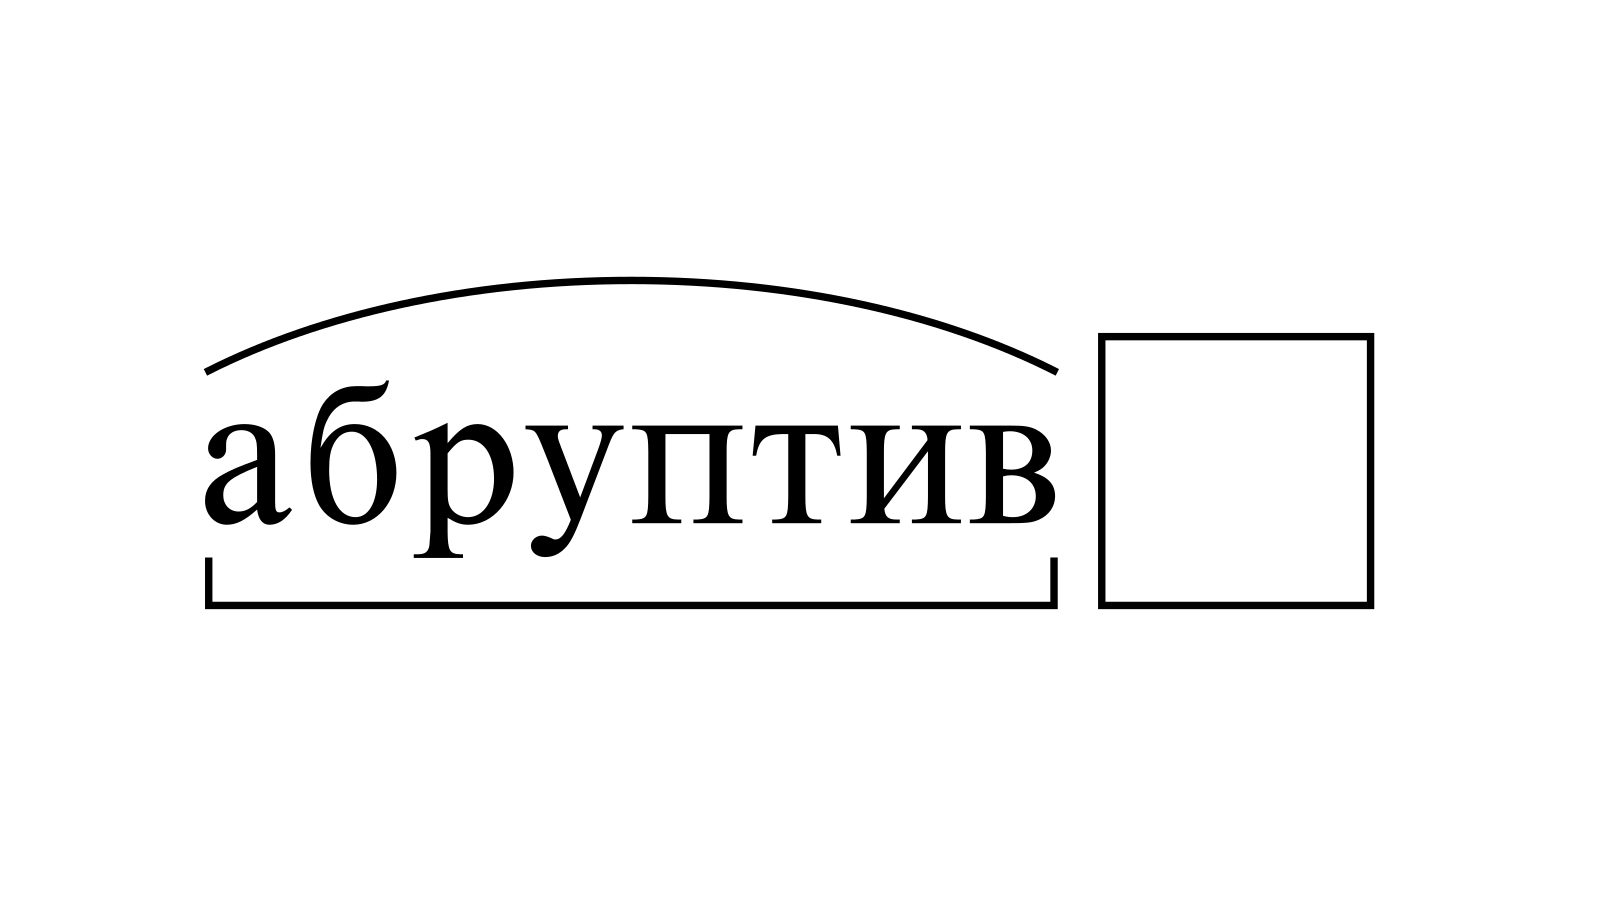 Разбор слова «абруптив» по составу